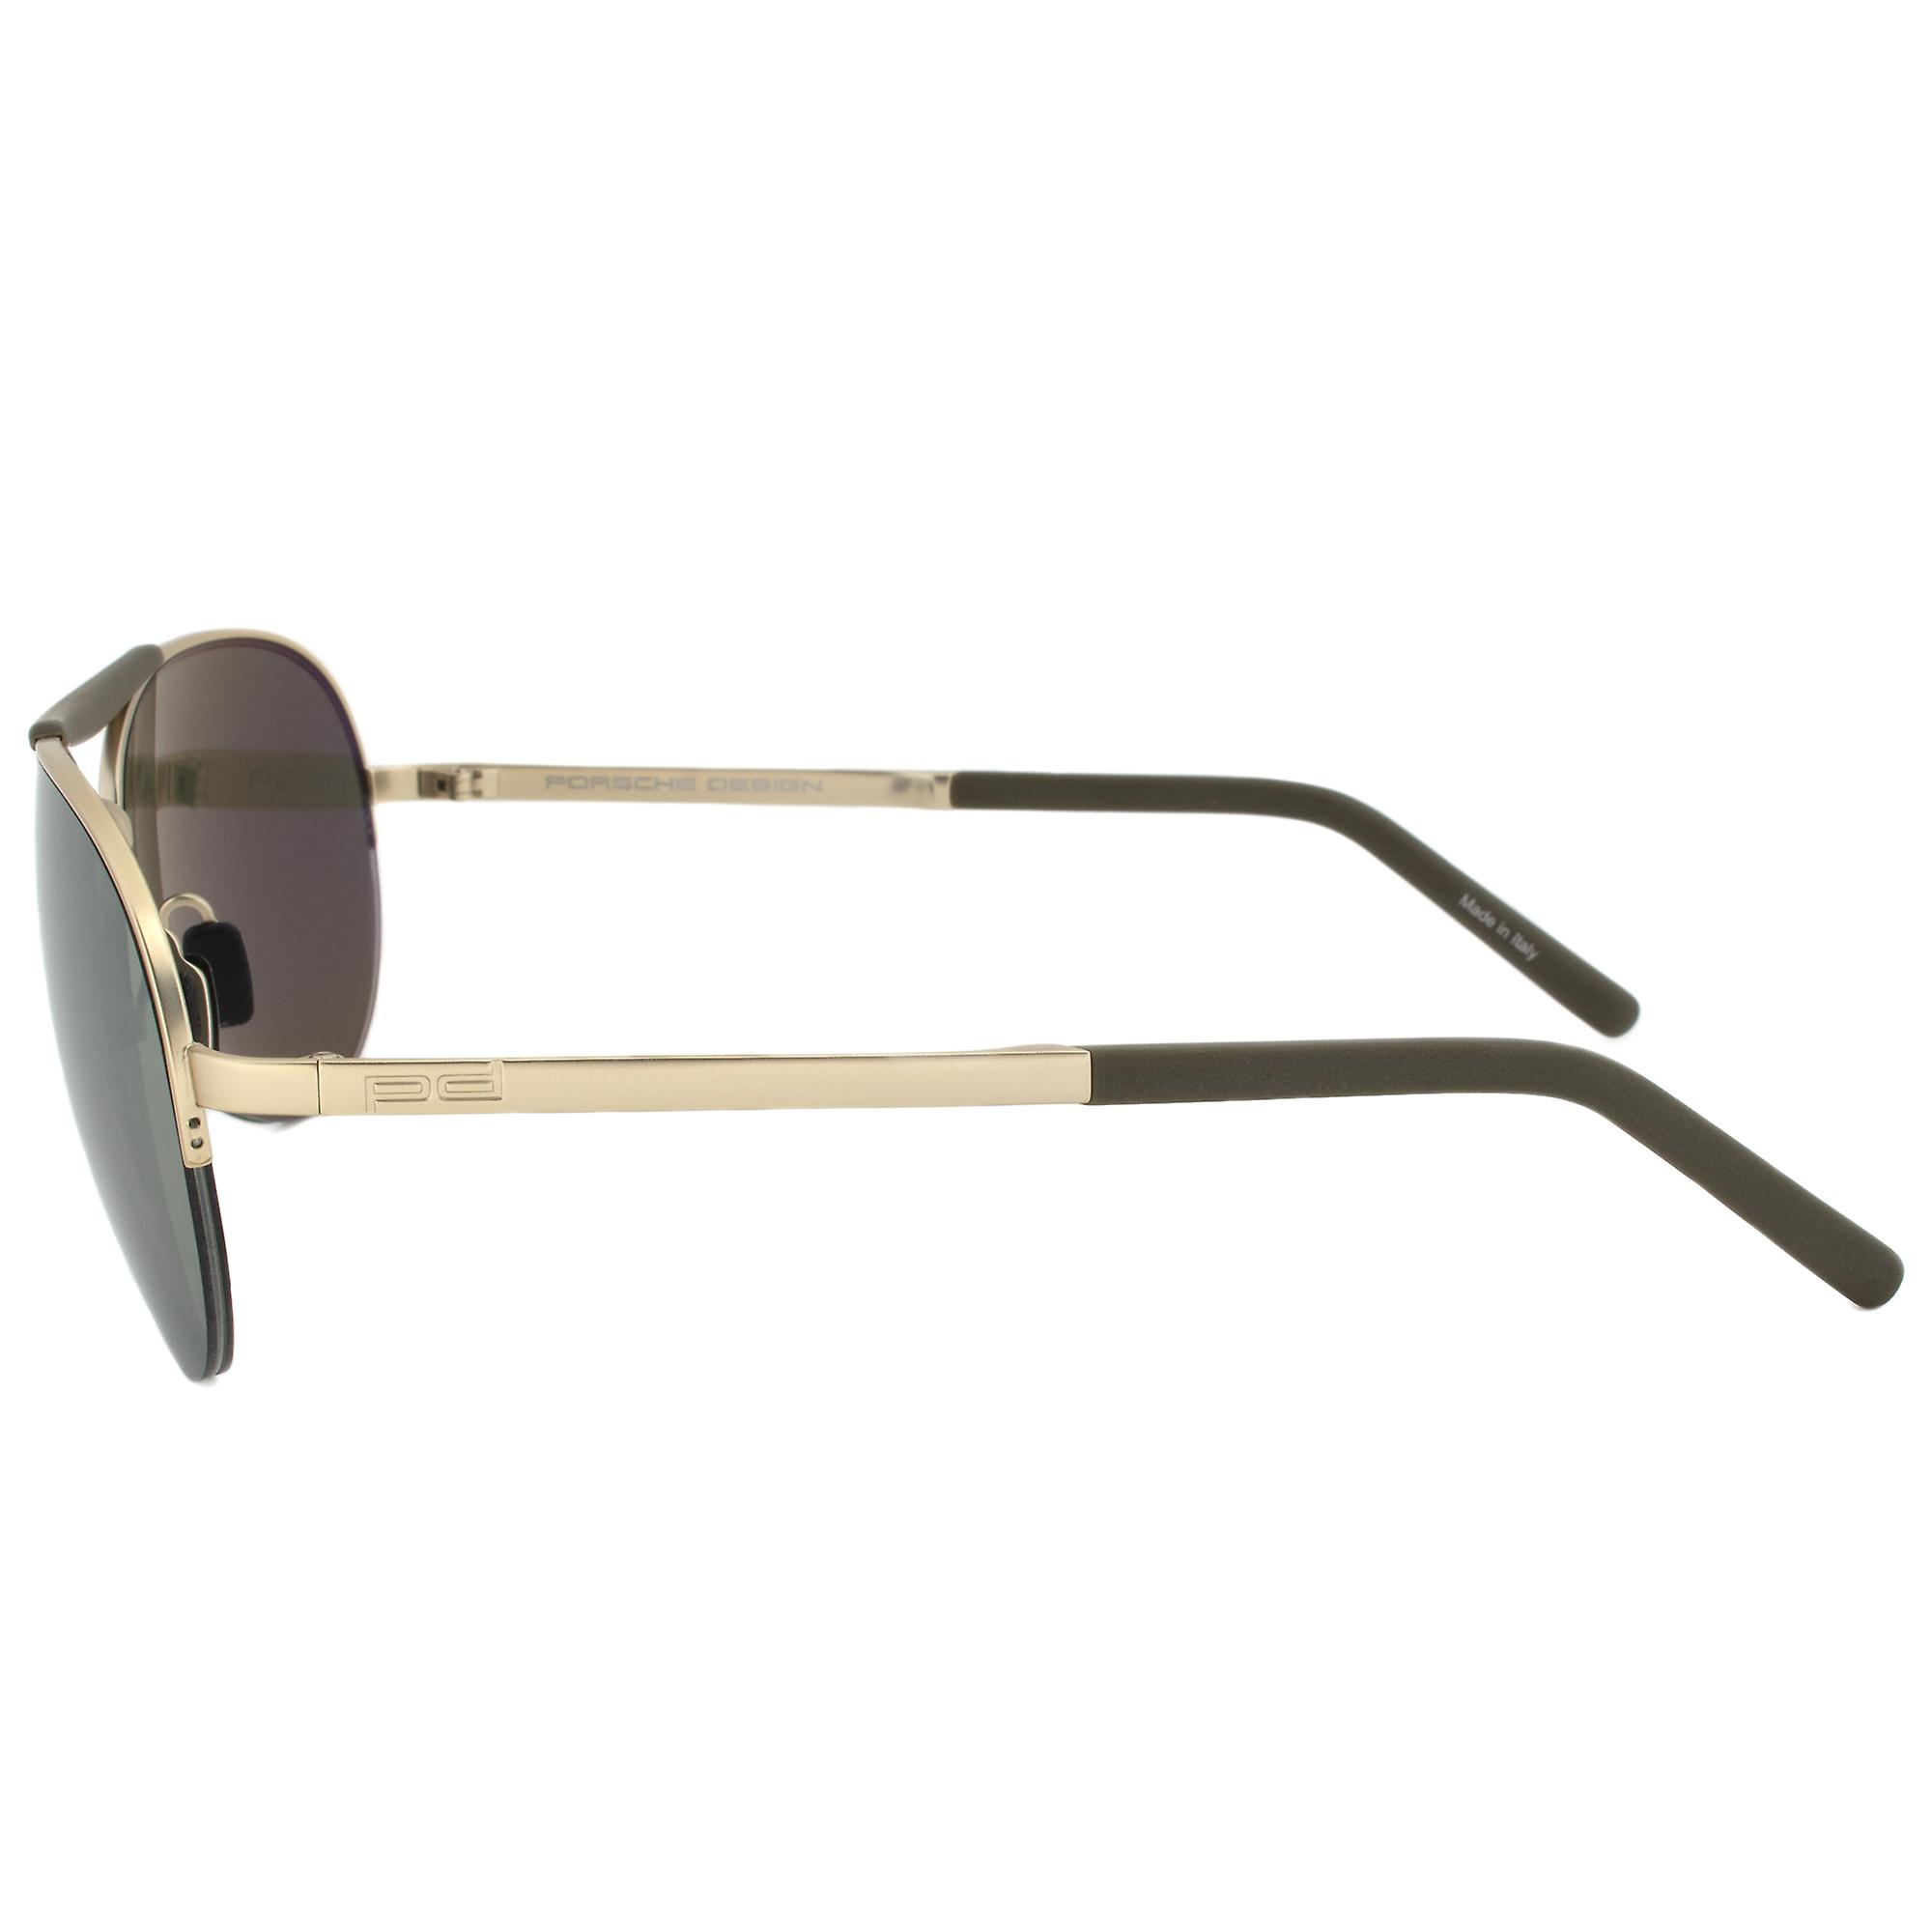 Porsche Design Design P8540 C Aviator Sunglasses | Light Gold Frame | Olive Silver Mirror Lens